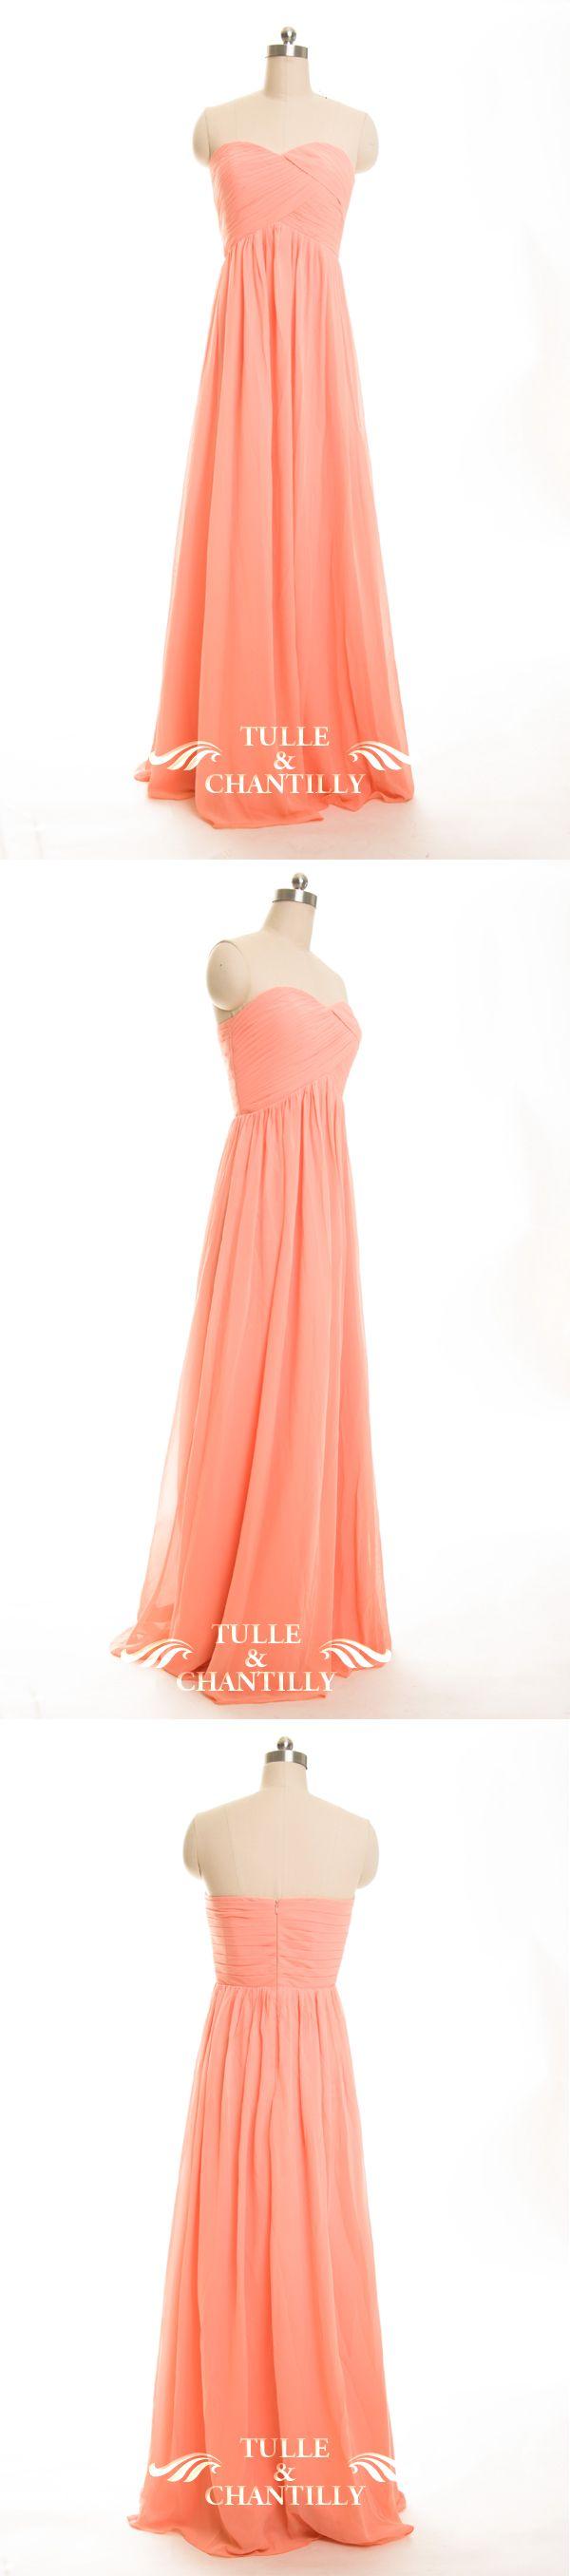 soap orange chiffon bridesmaid dresses with strapless sweetheart